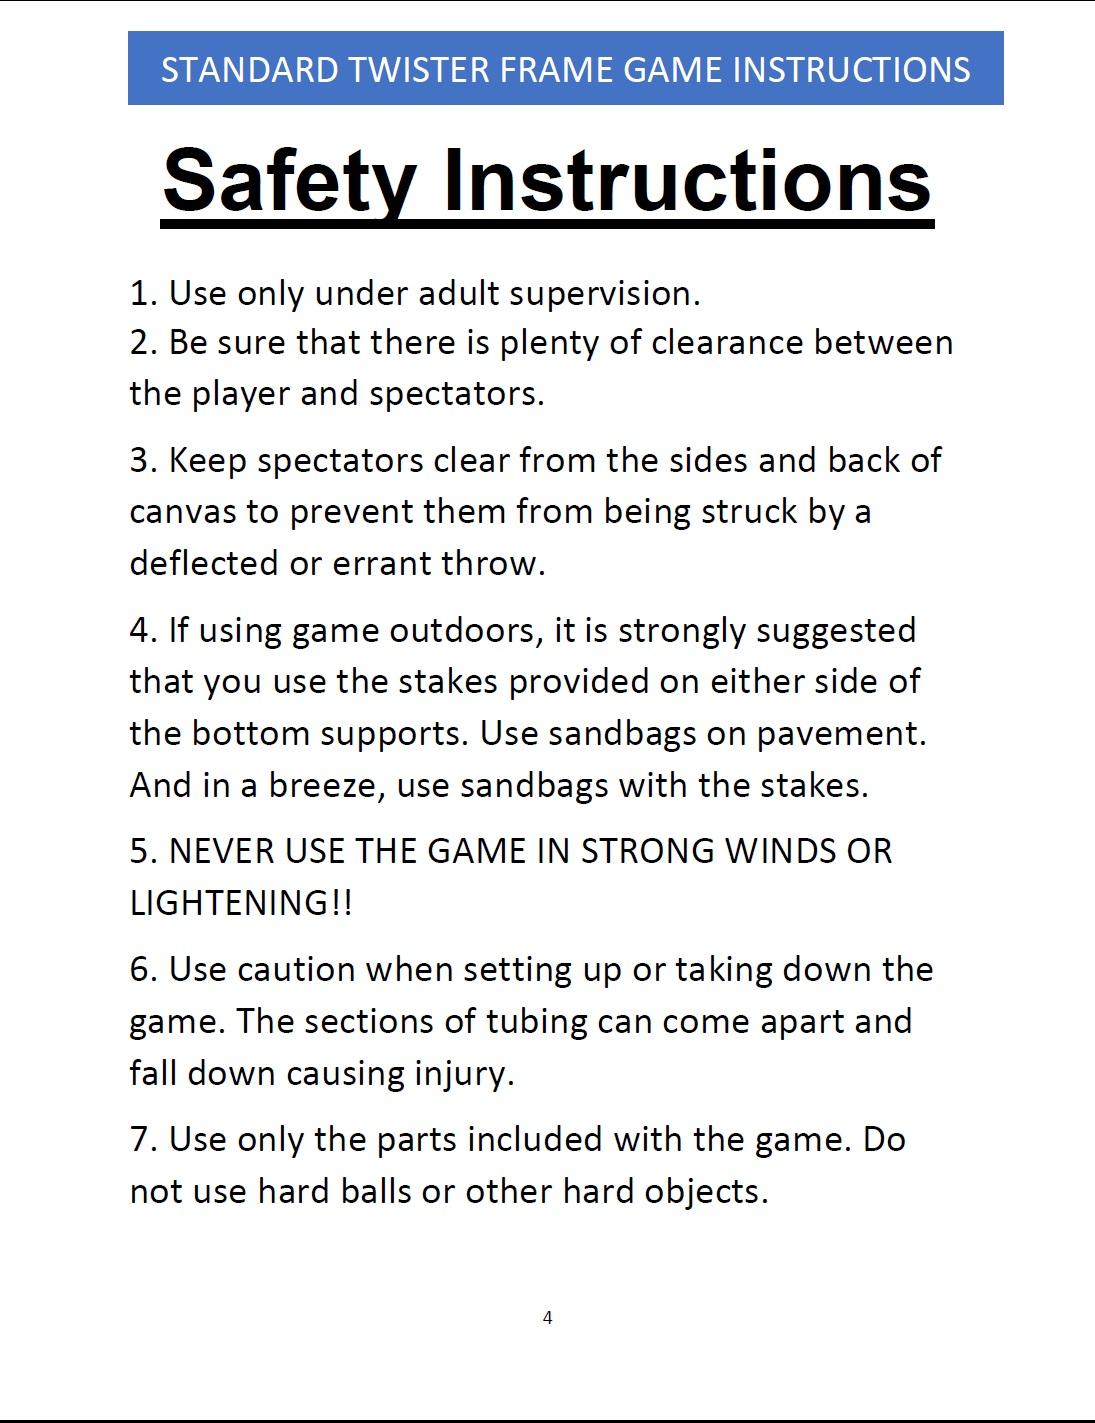 standard-twister-frame-game-instructions-page-4.jpg